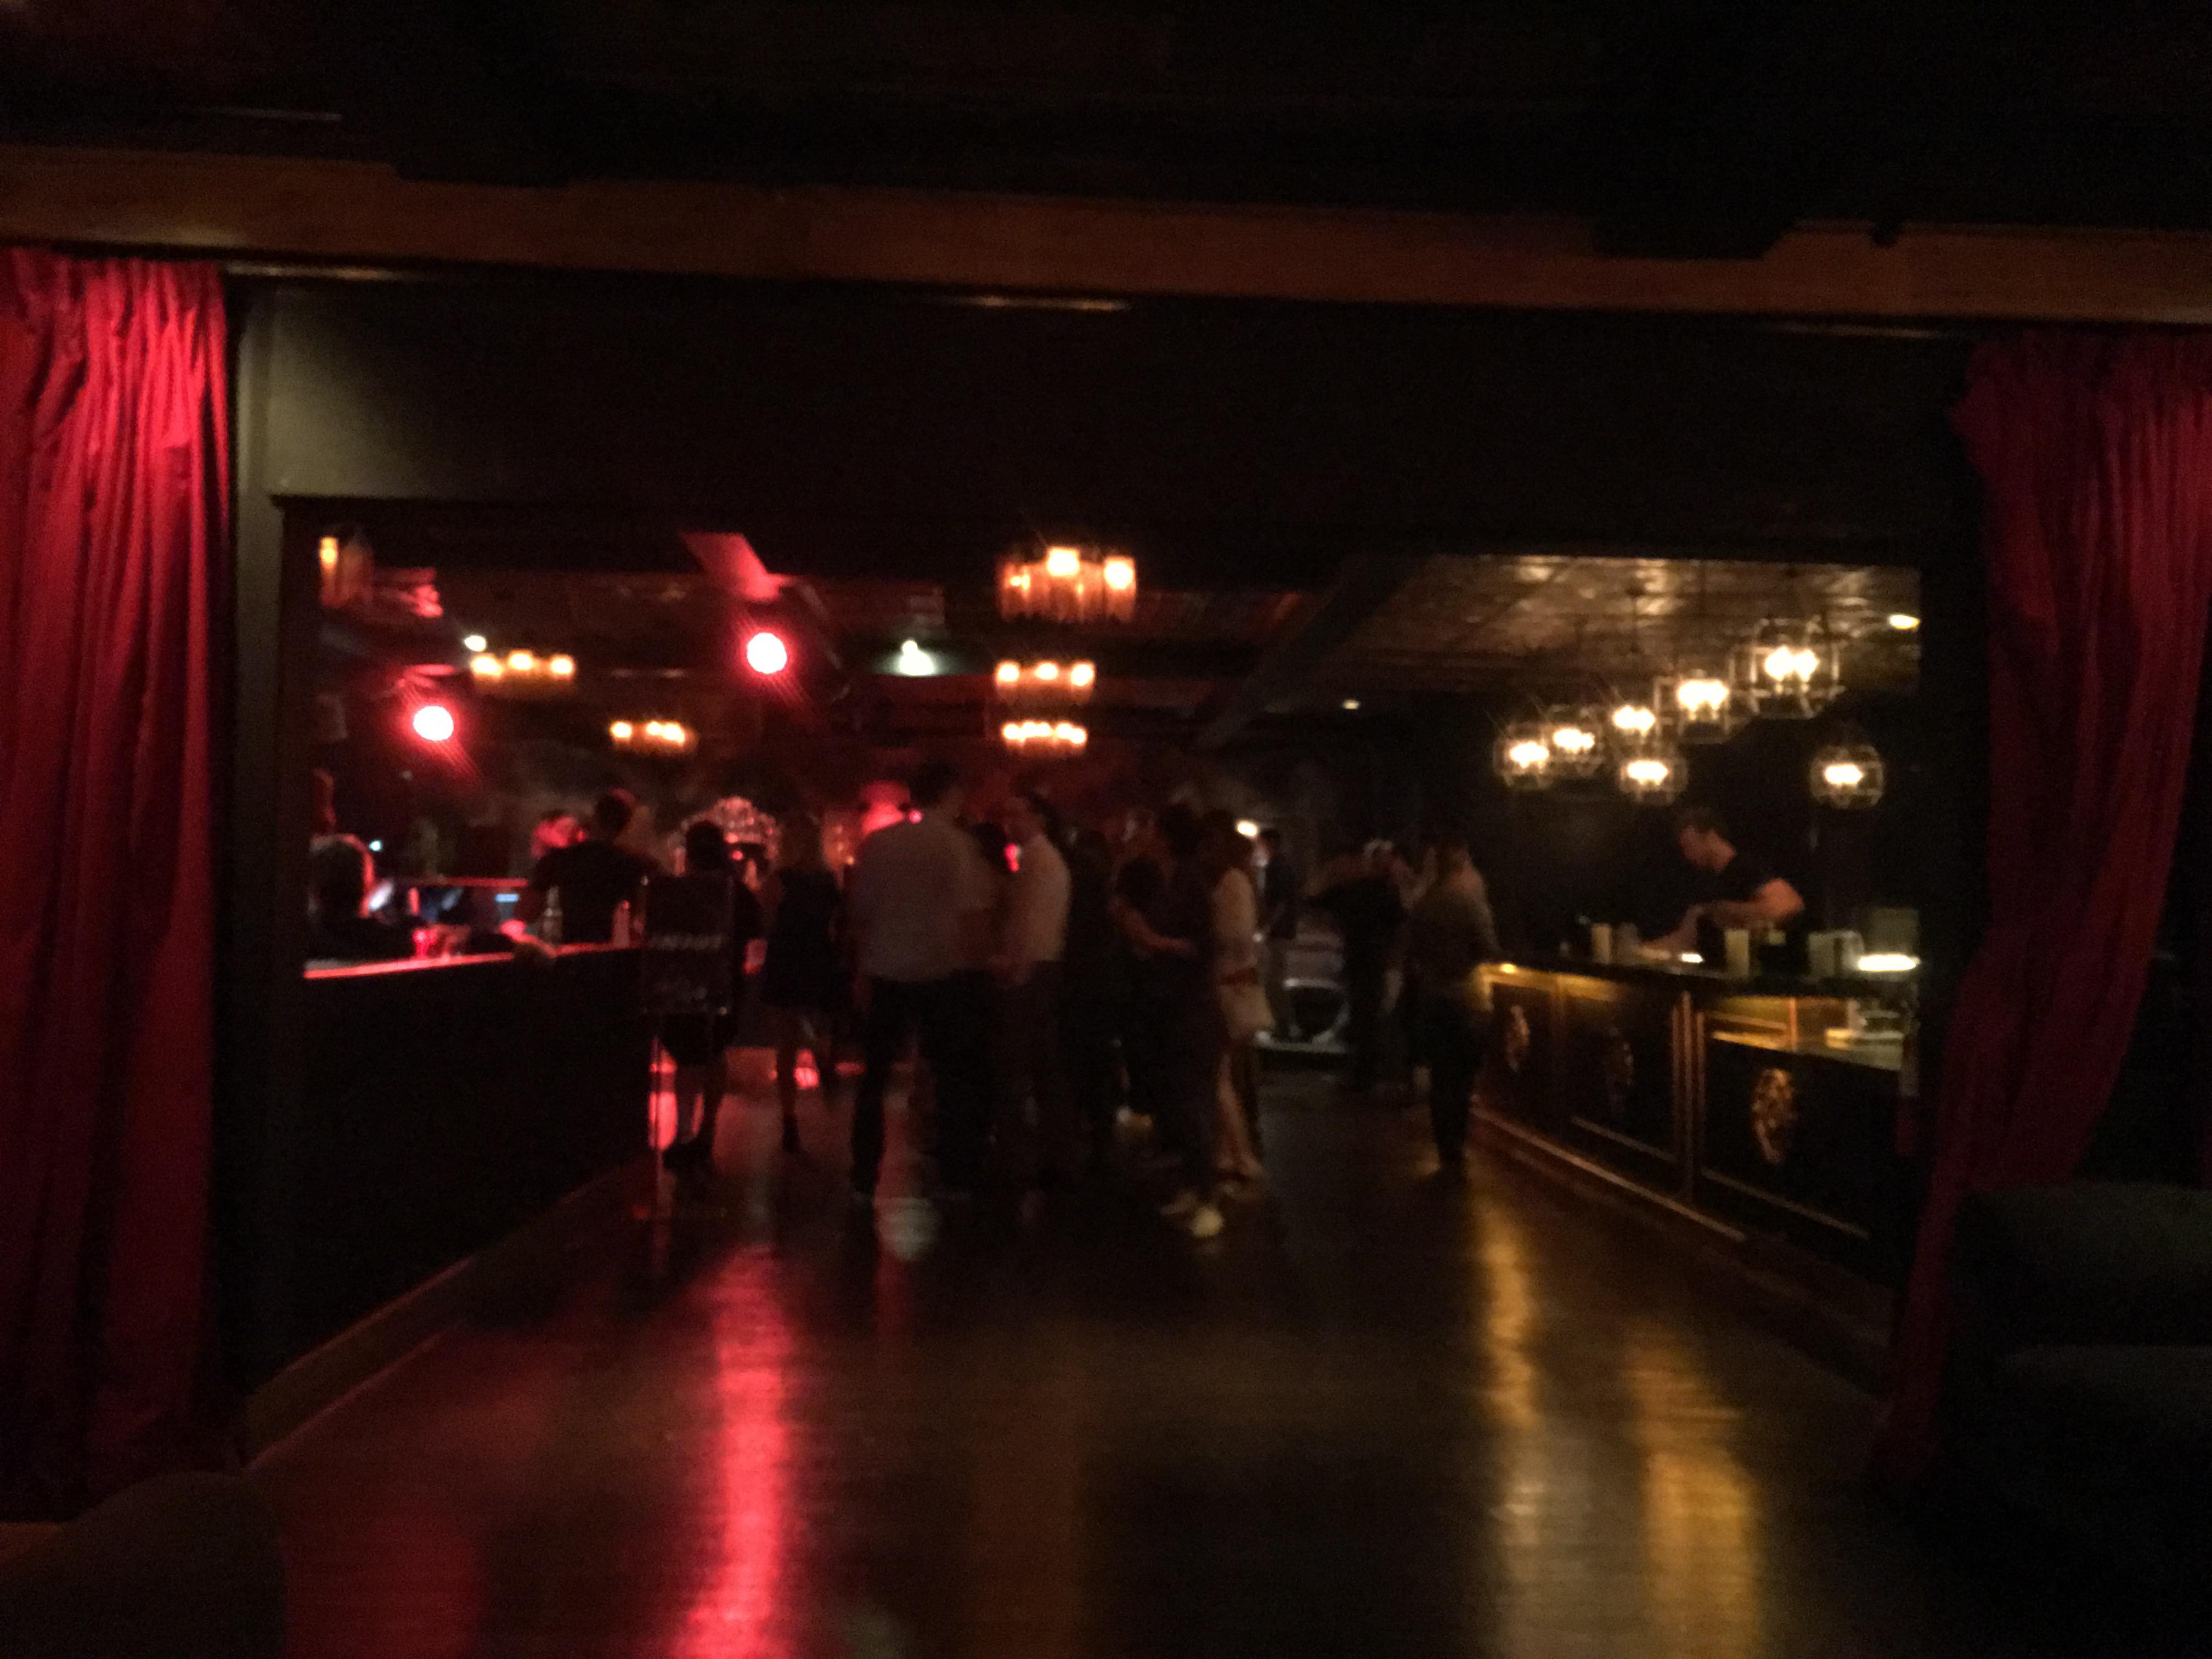 Ubi 30 Party in Hollywood / Exterior - Karaoke Lounge